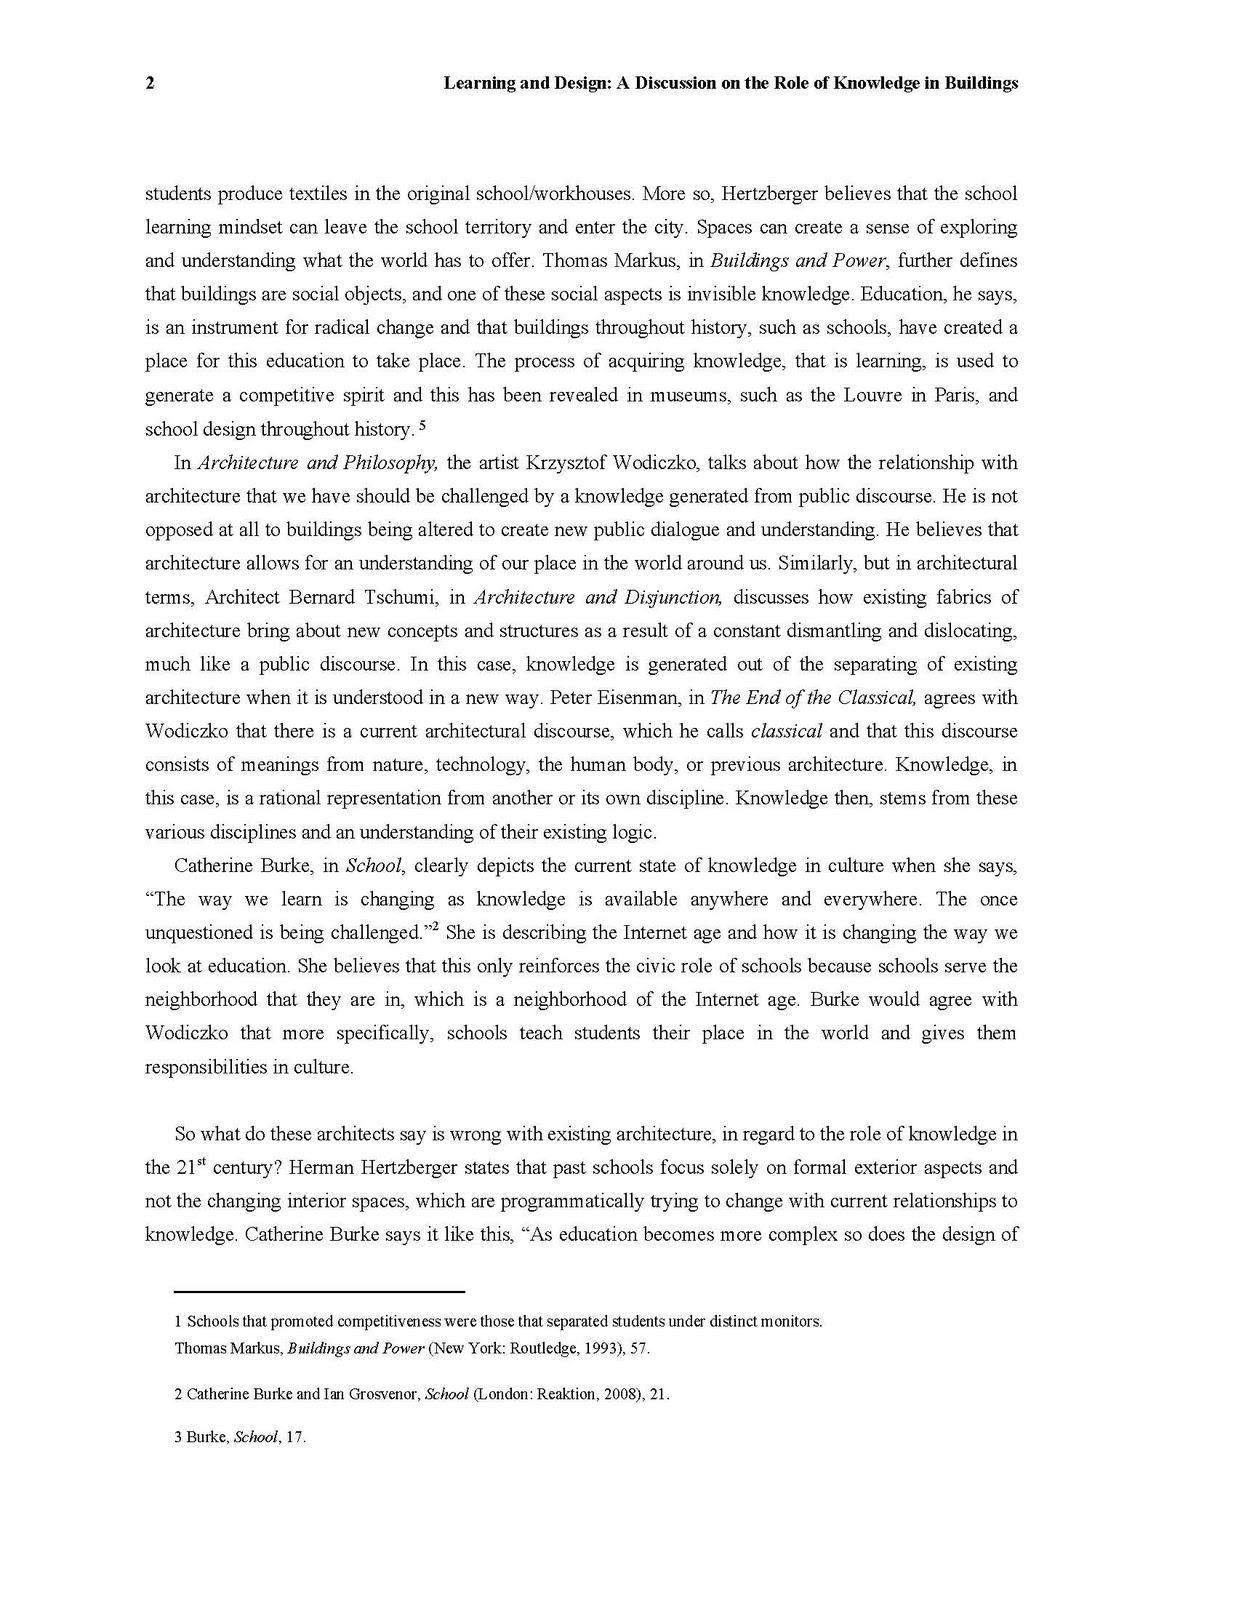 006 Bibliographic Essay Bibliogahhicessay Page 2 Wondrous Example Mla Outline Full